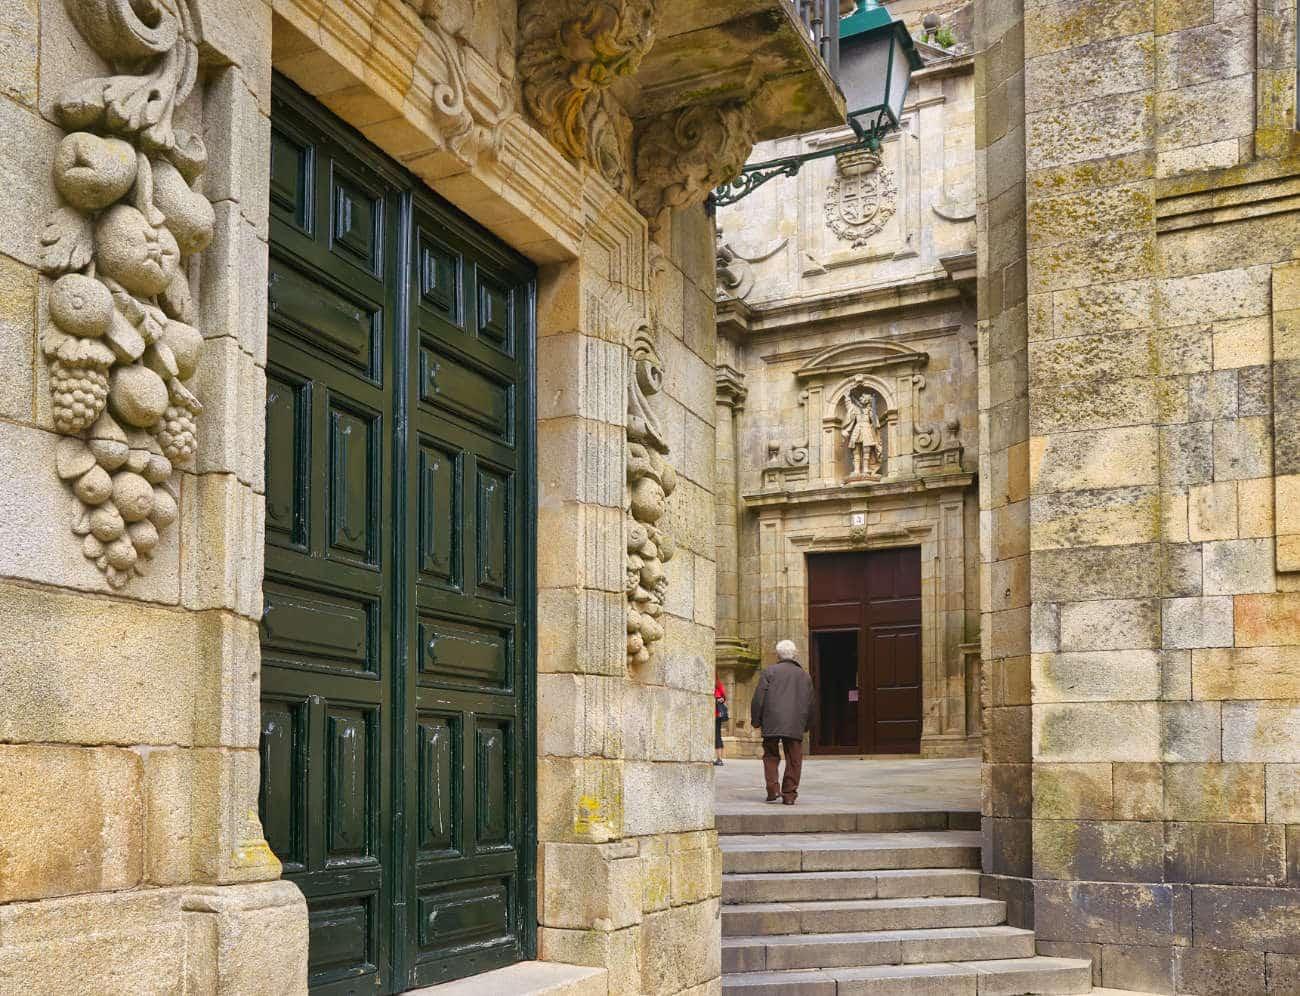 San Paio de Alteares Santiago